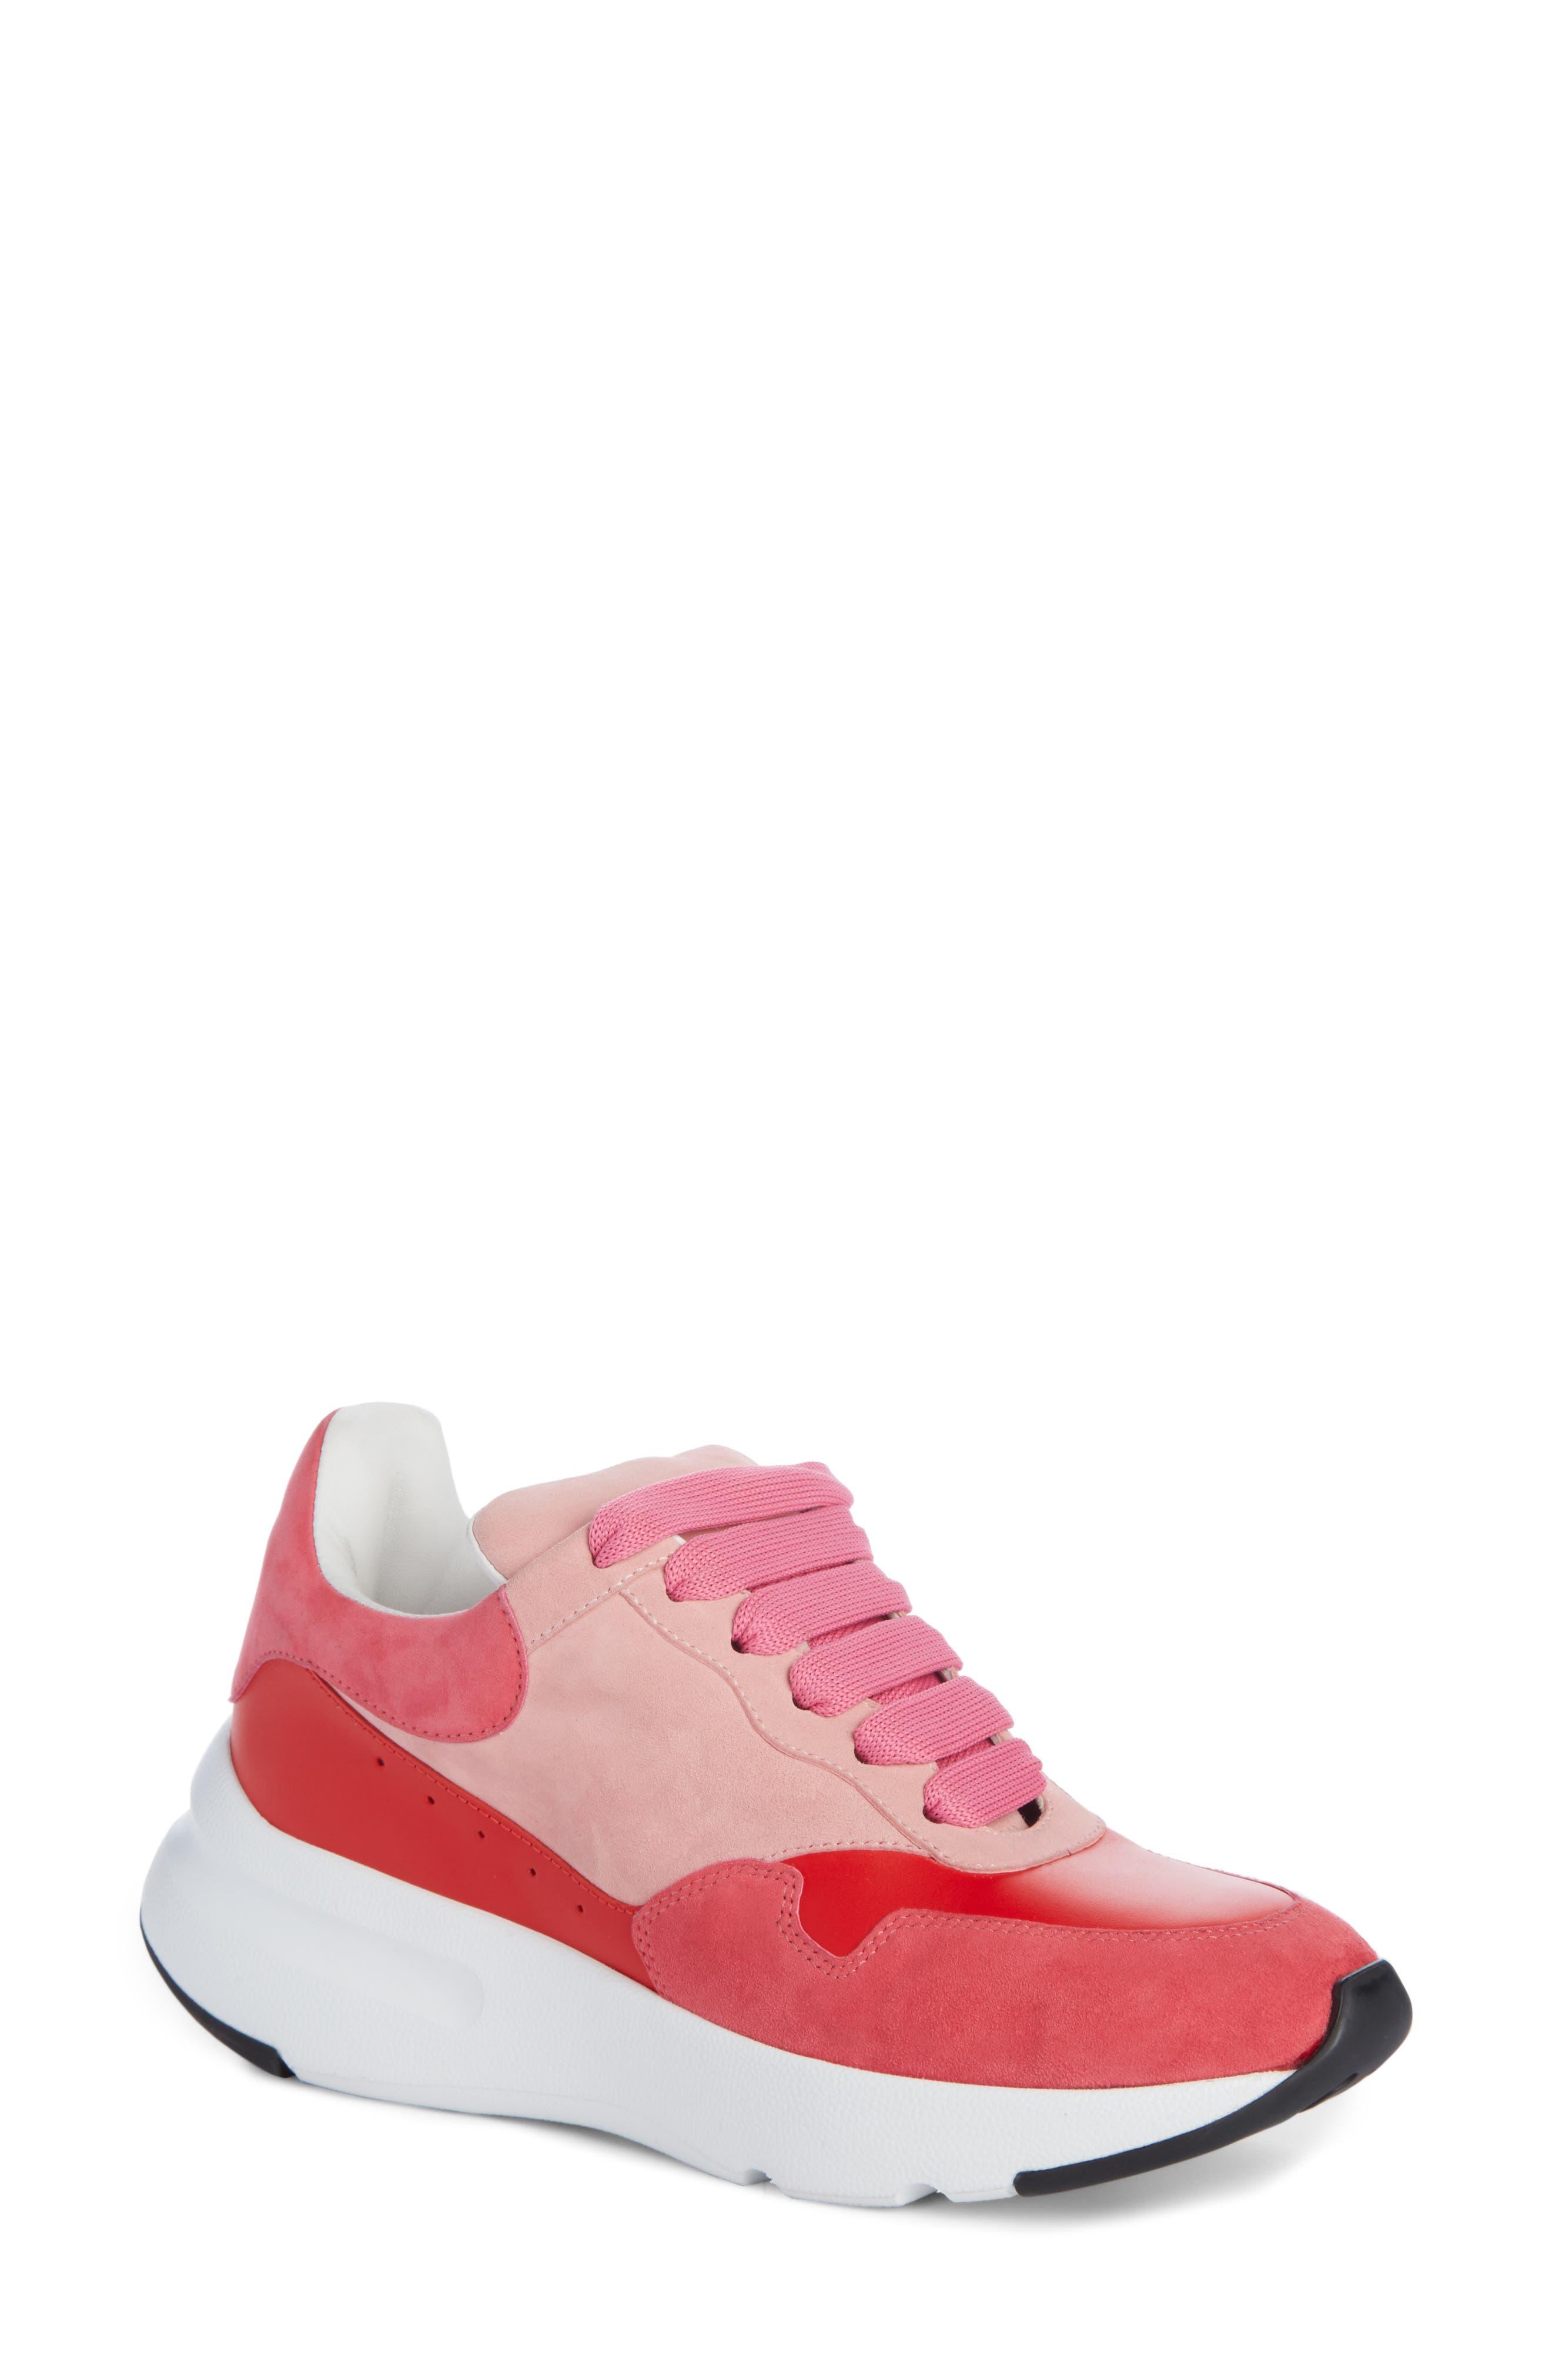 Main Image - Alexander McQueen Runner Lace-Up Sneaker (Women)